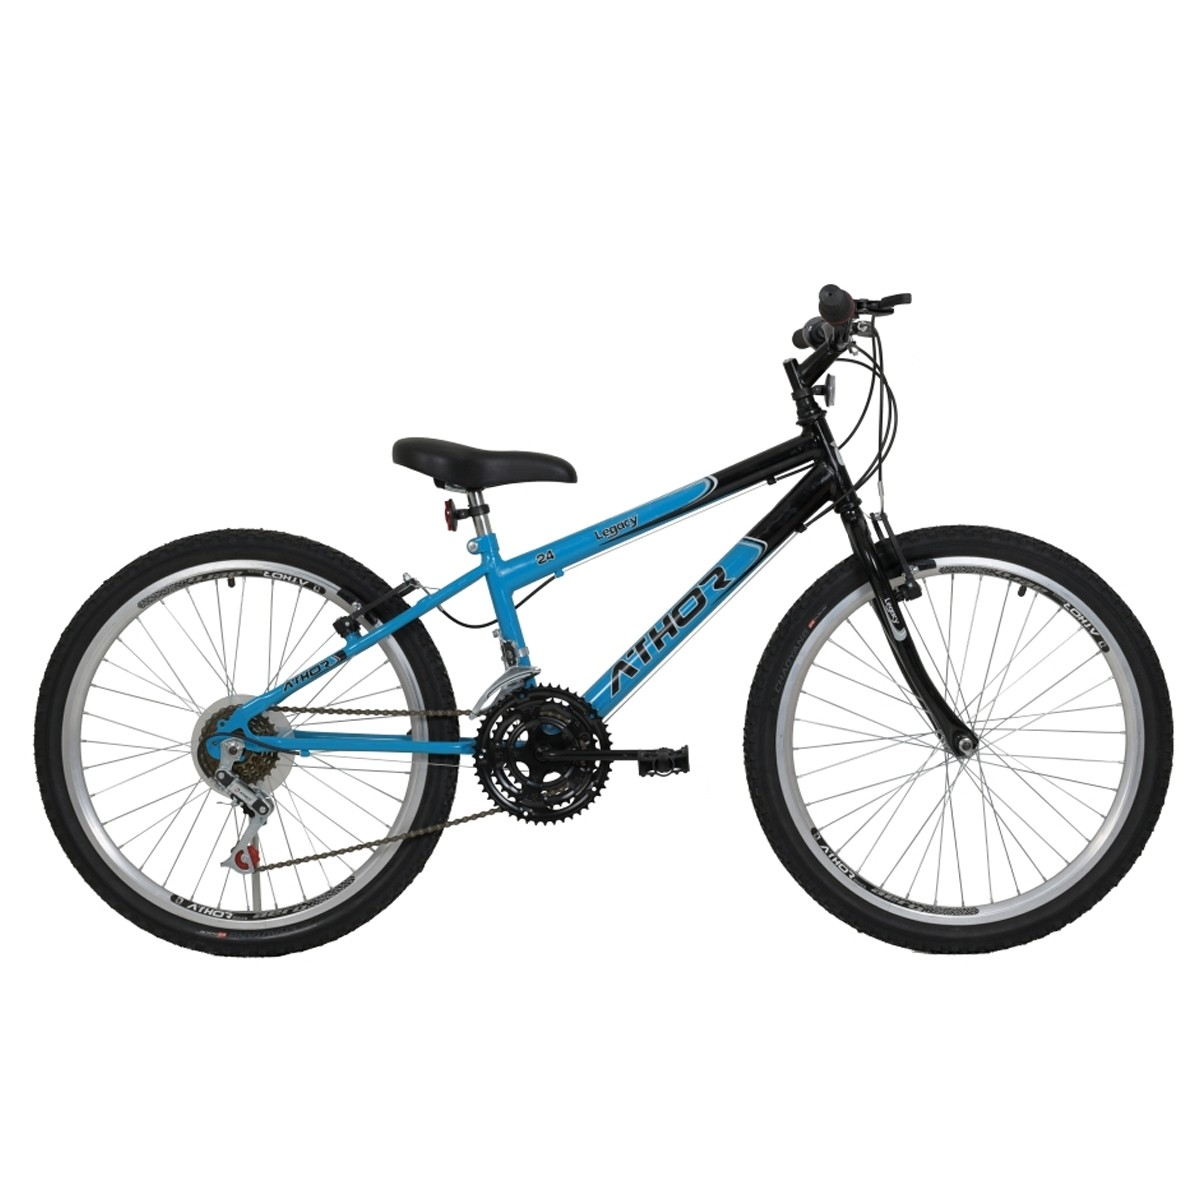 Bicicleta Athor Legacy Infantil Aro 24 18v Masculino